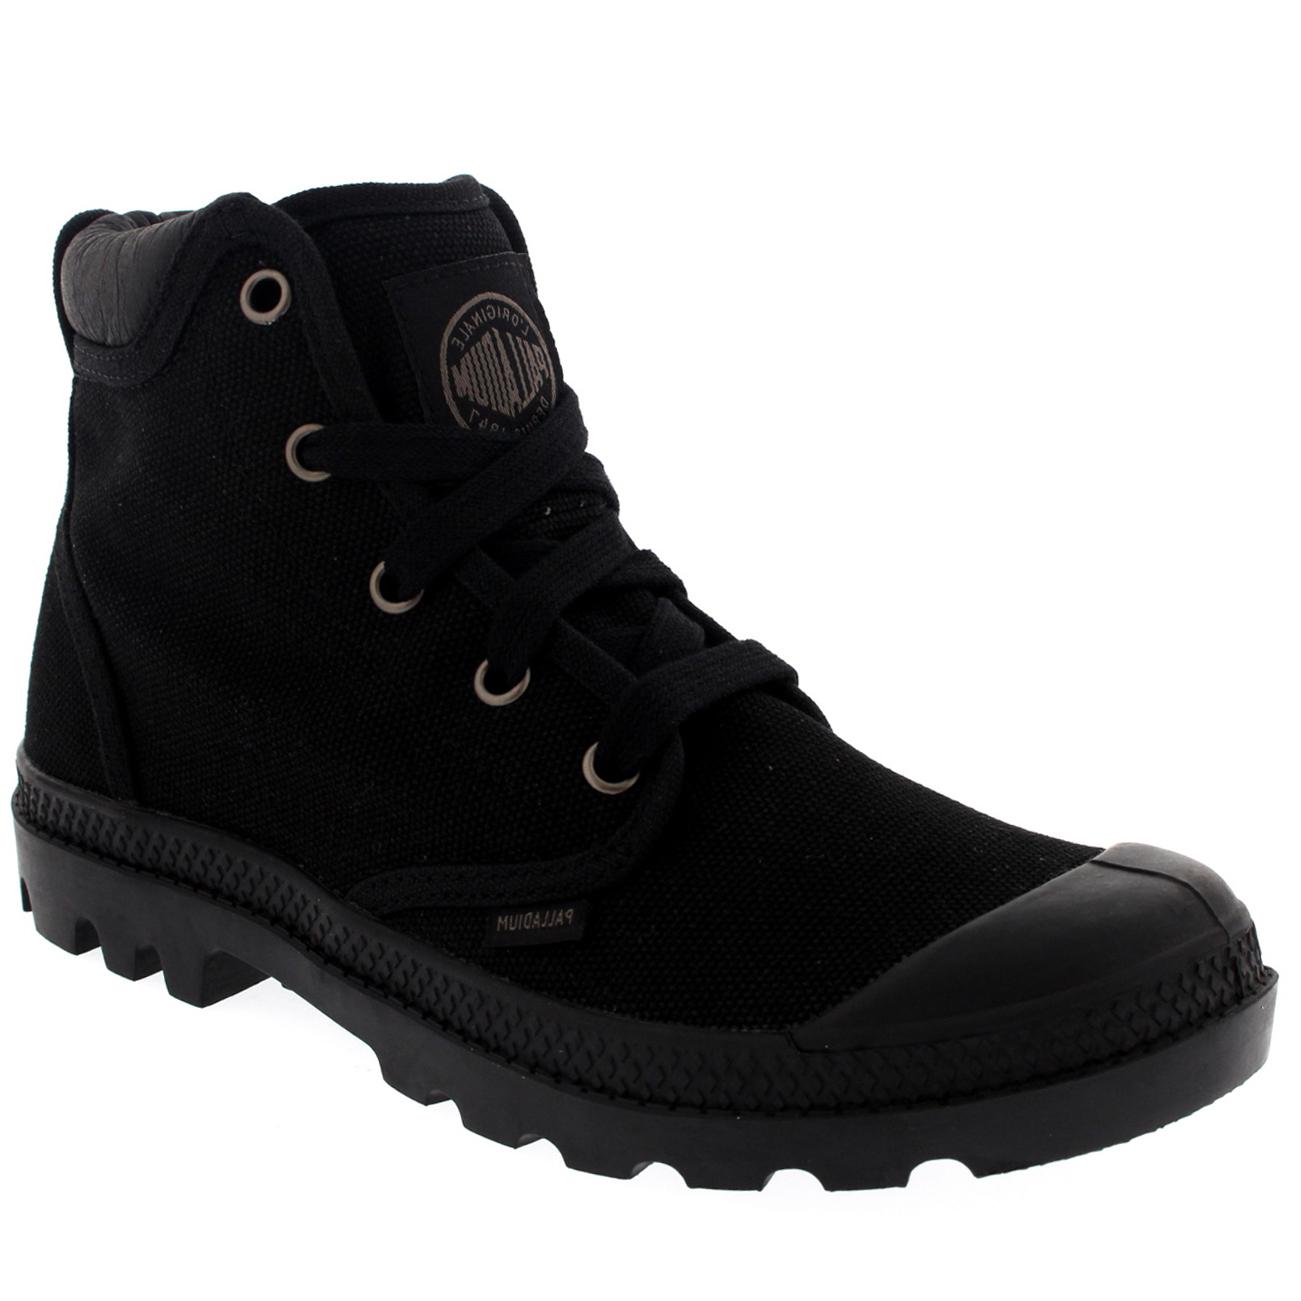 Palladium Pamp Hi Boots